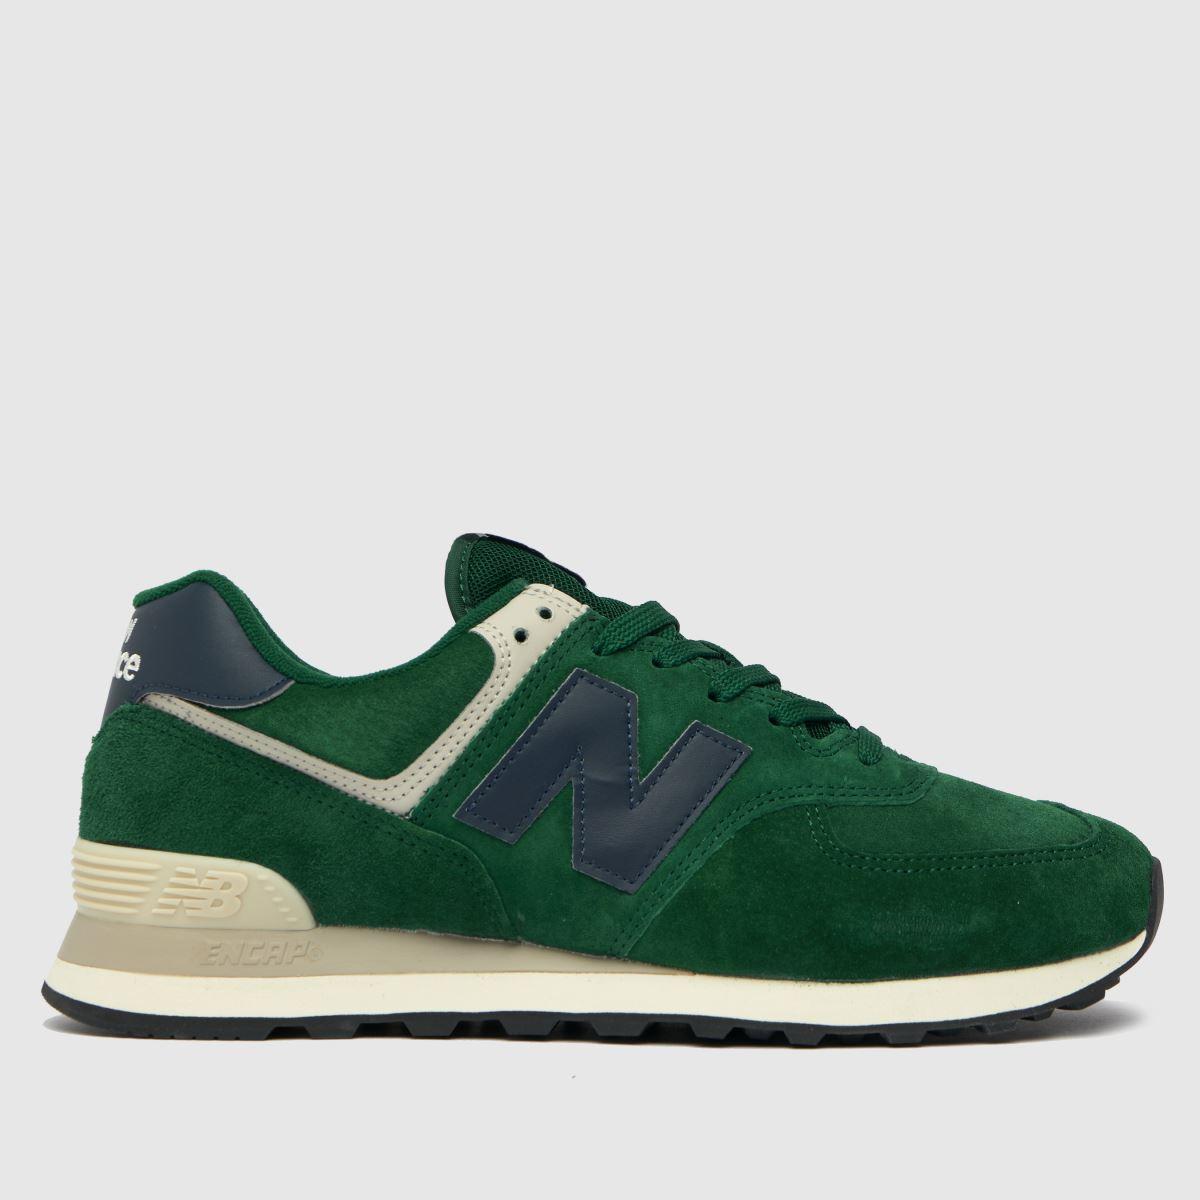 New Balance Dark Green 574 Trainers